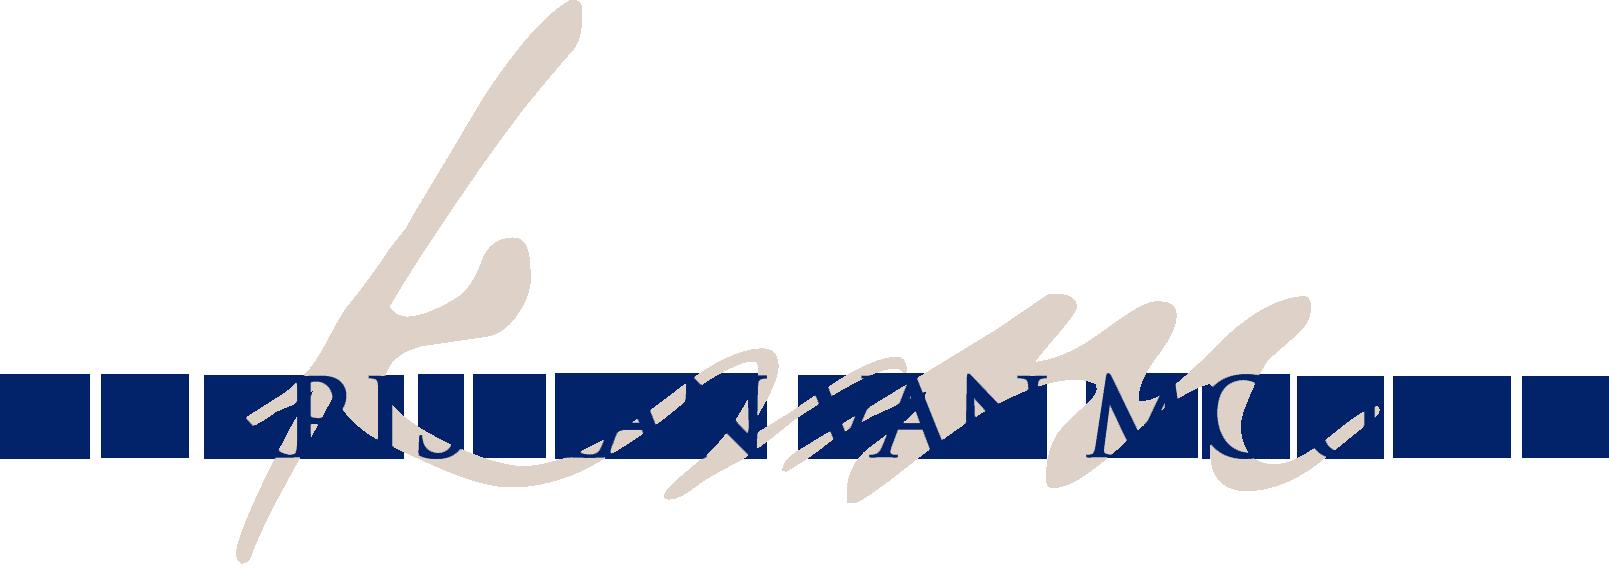 Logo-with-dr-no-oral...-copy.png